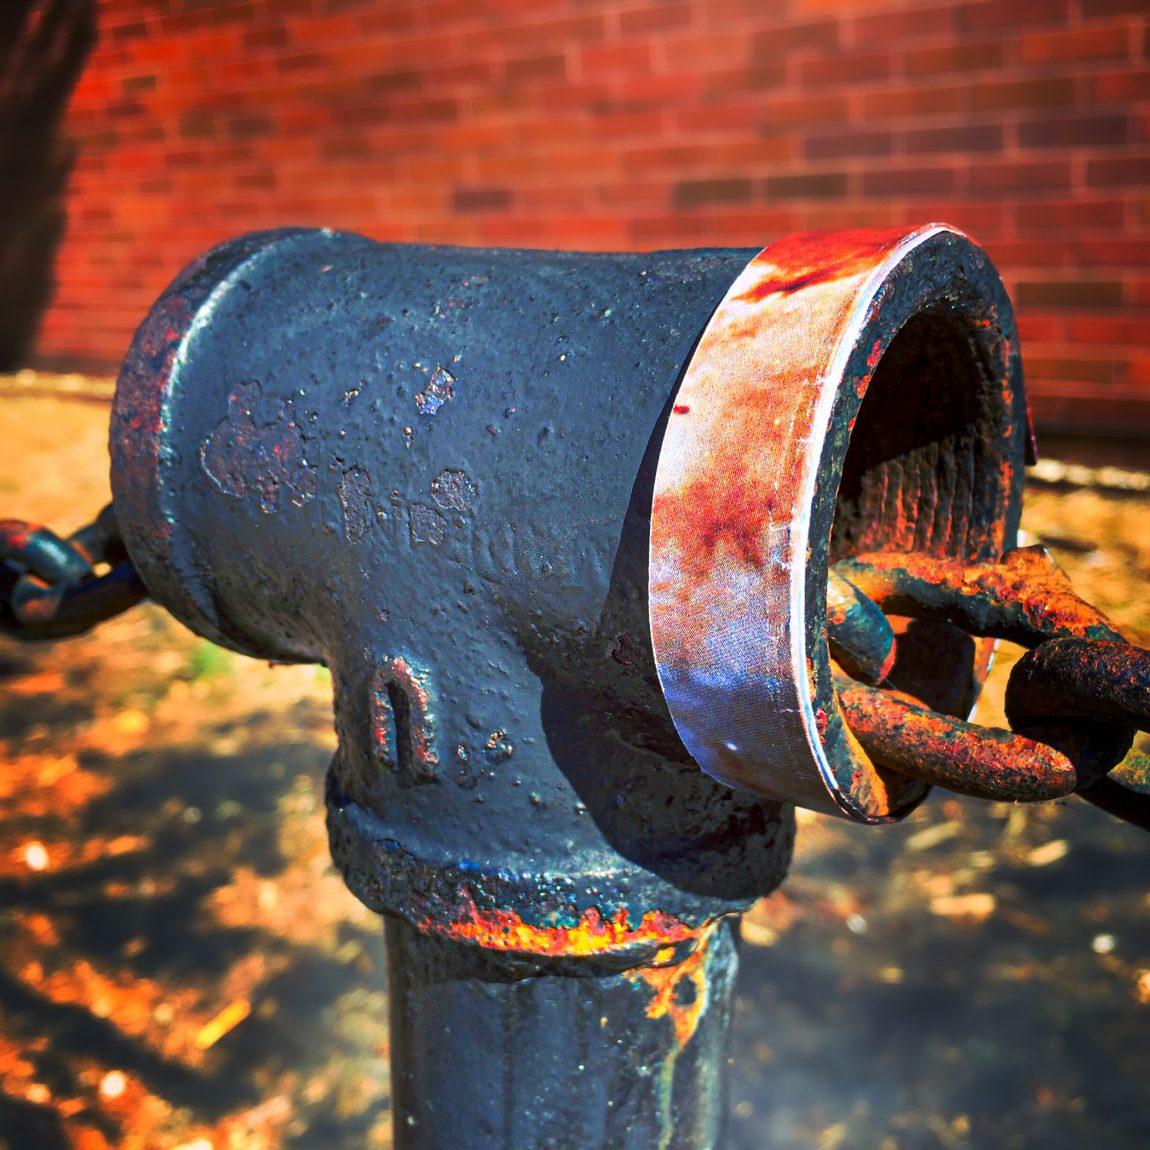 Carina Nebula wrapped around fence post at United States Posr Office